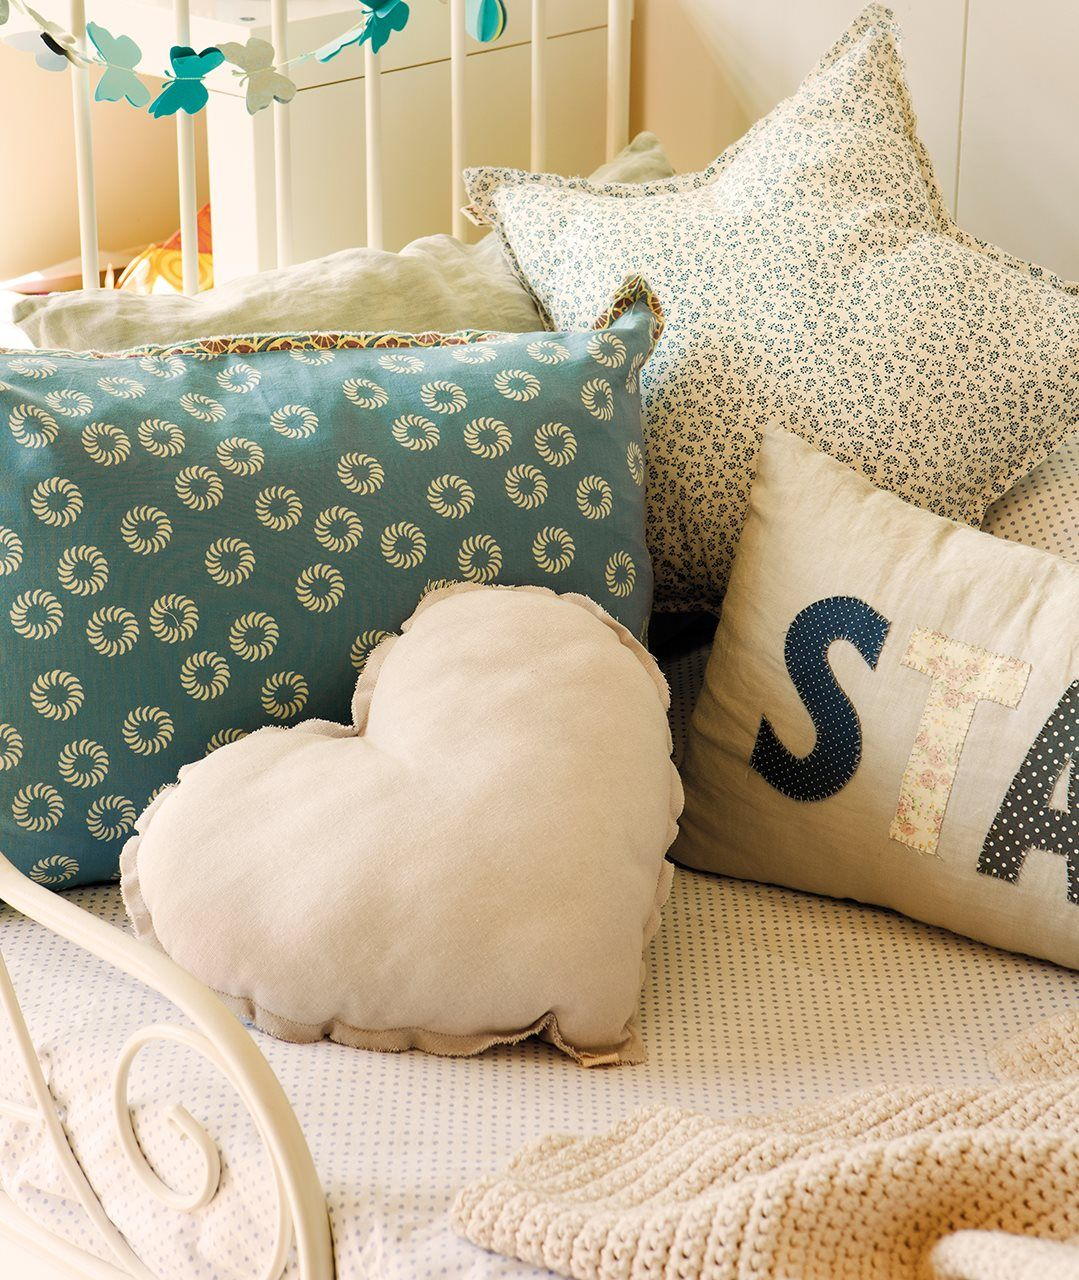 Картинки на подушке смотреть онлайн